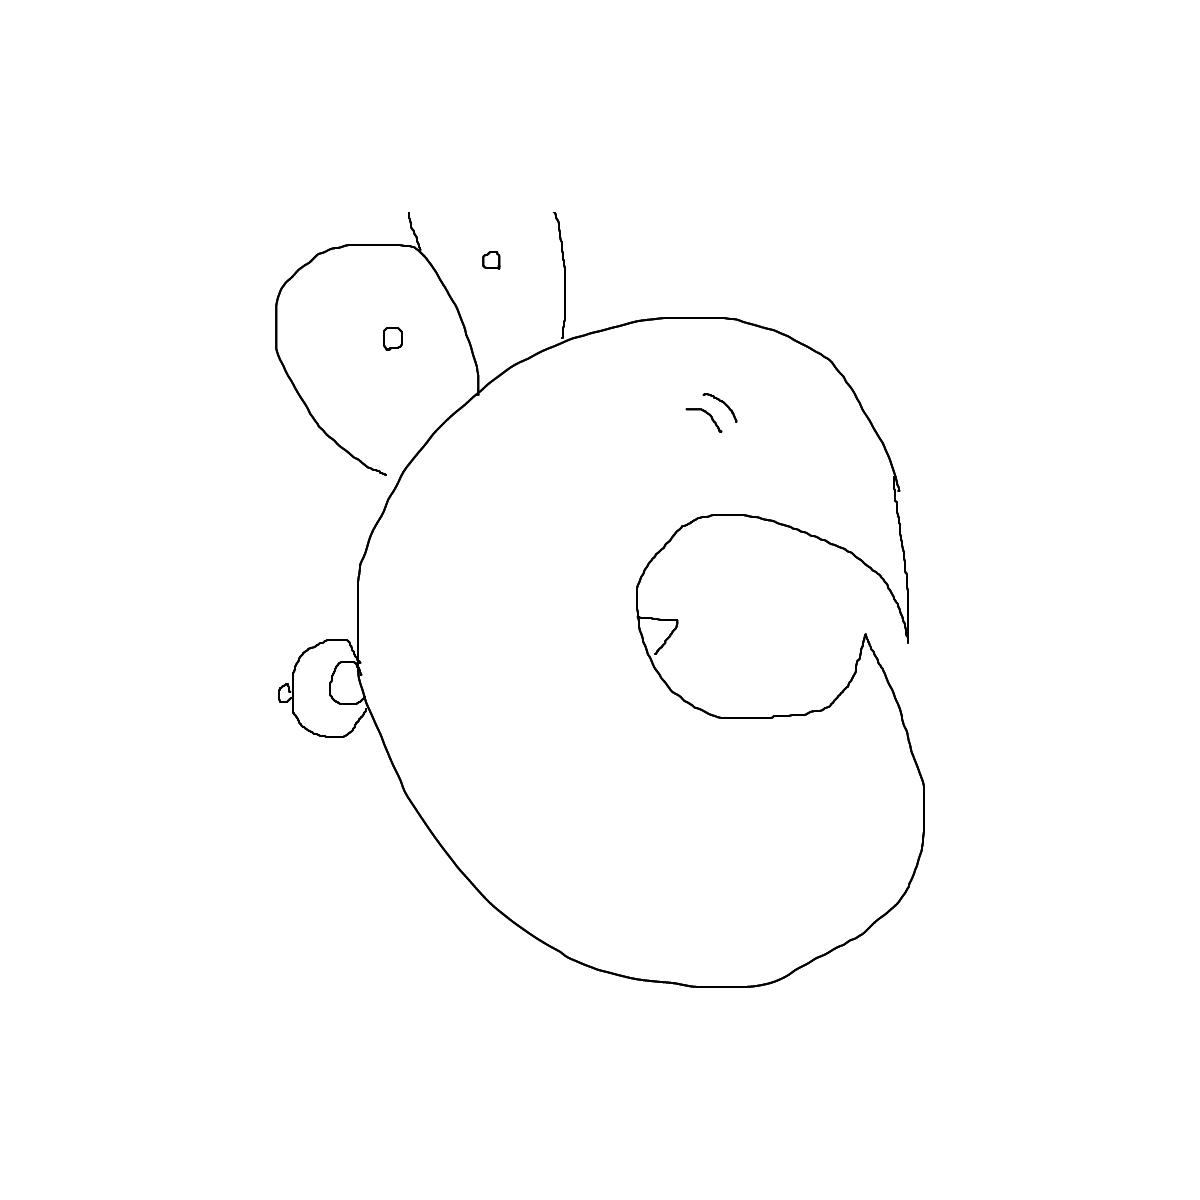 BAAAM drawing#12629 lat:30.5231533050537100lng: -97.5397186279296900